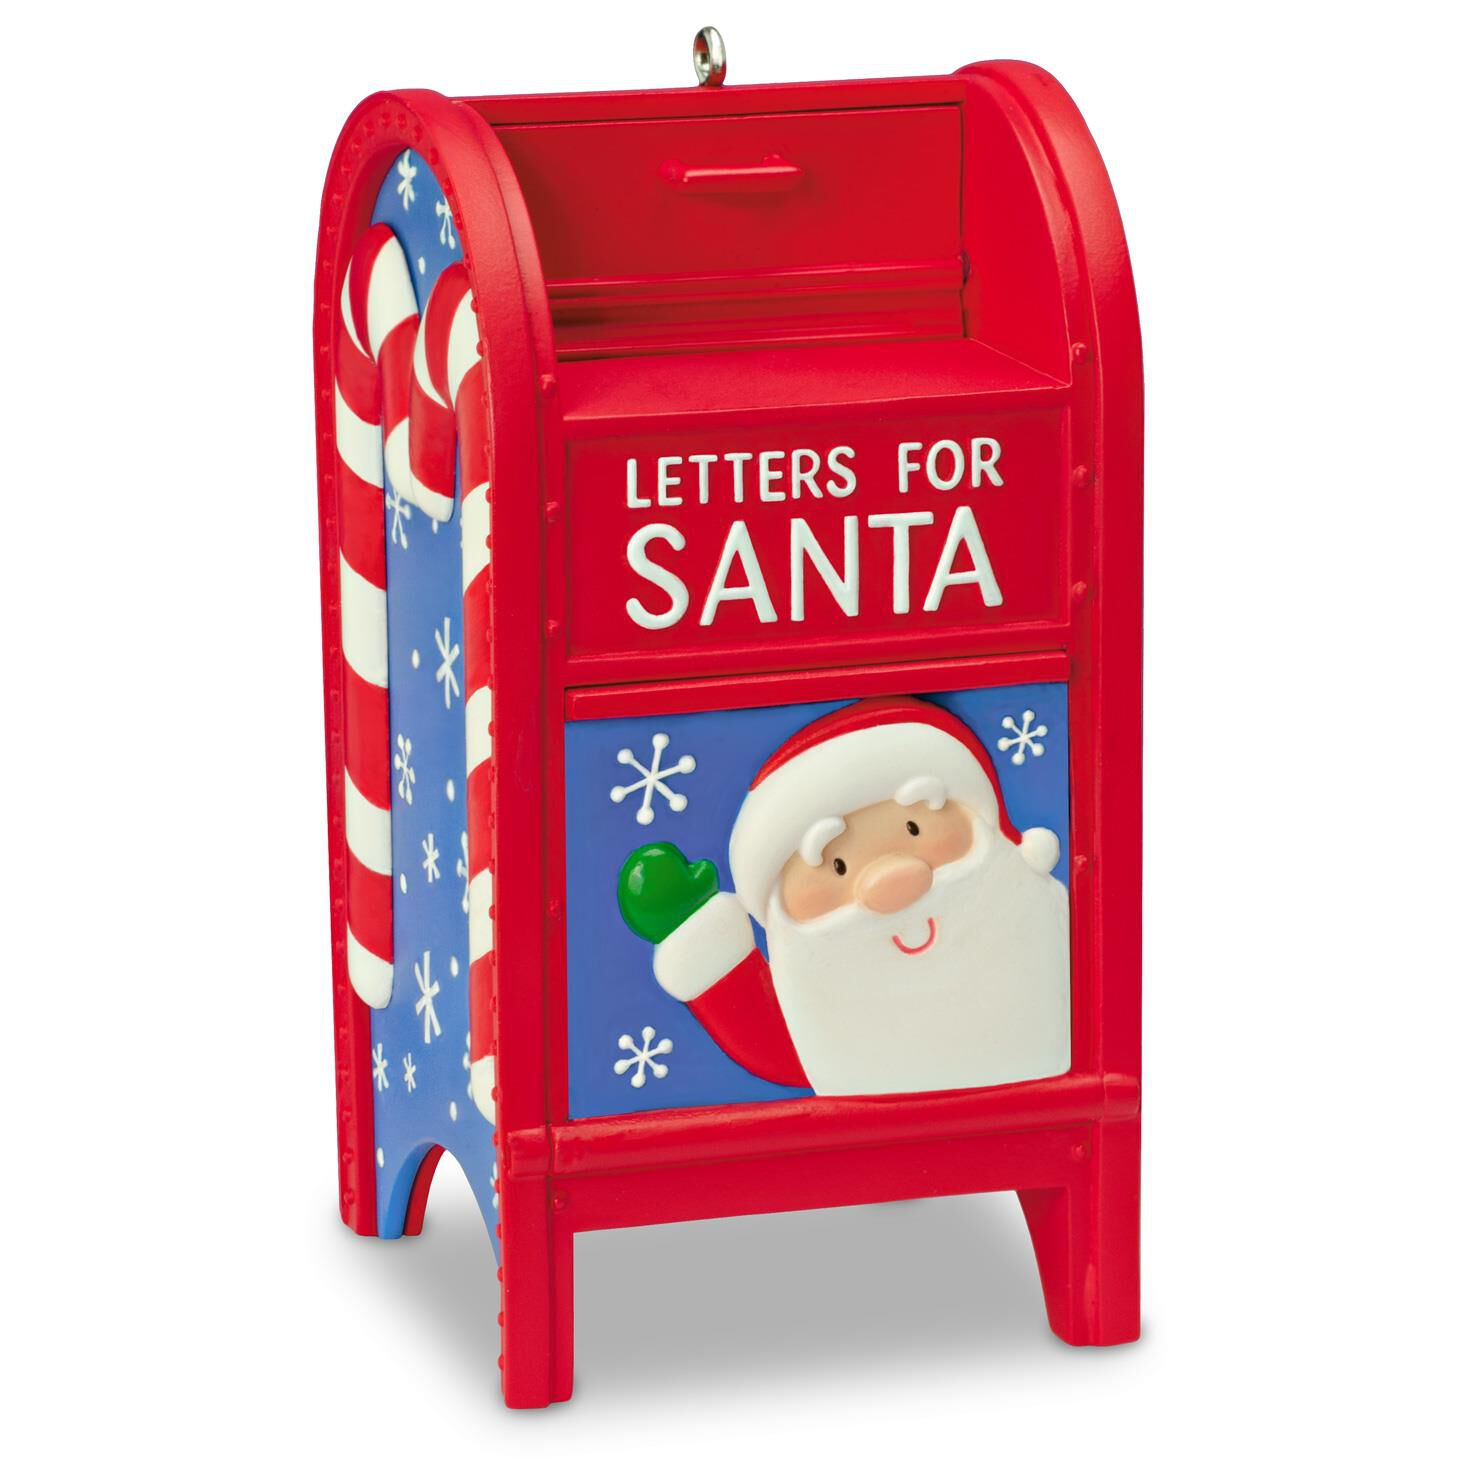 Letters For Santa Mailbox Ornament Keepsake Ornaments